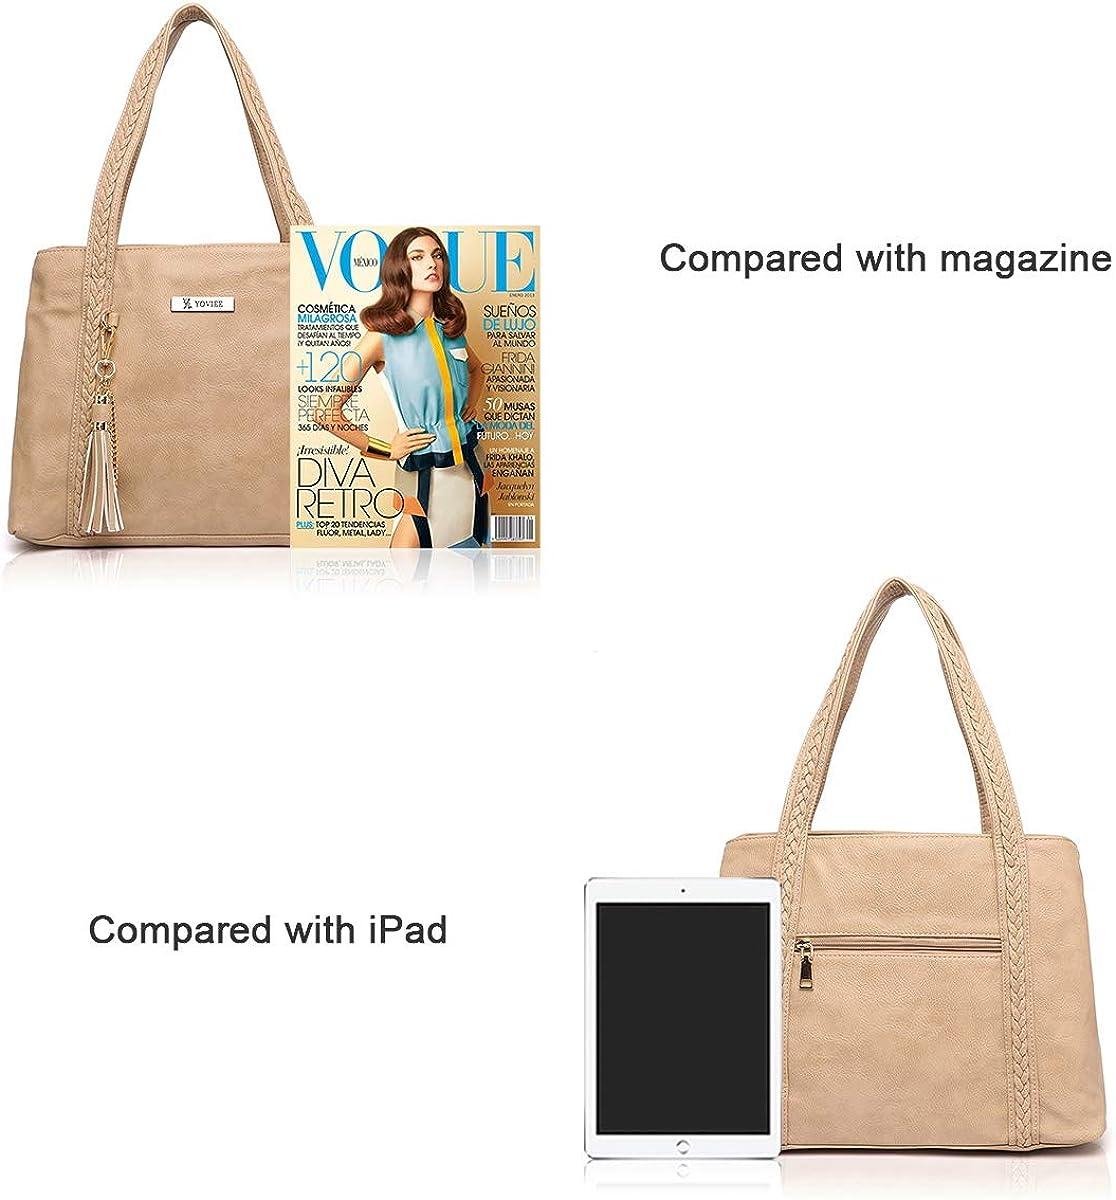 YOVIEE Designer Top Handle Handbags for Ldies Satchel Crossbody Shoulder Bag Purse Tassel for Travel Shopping 9630